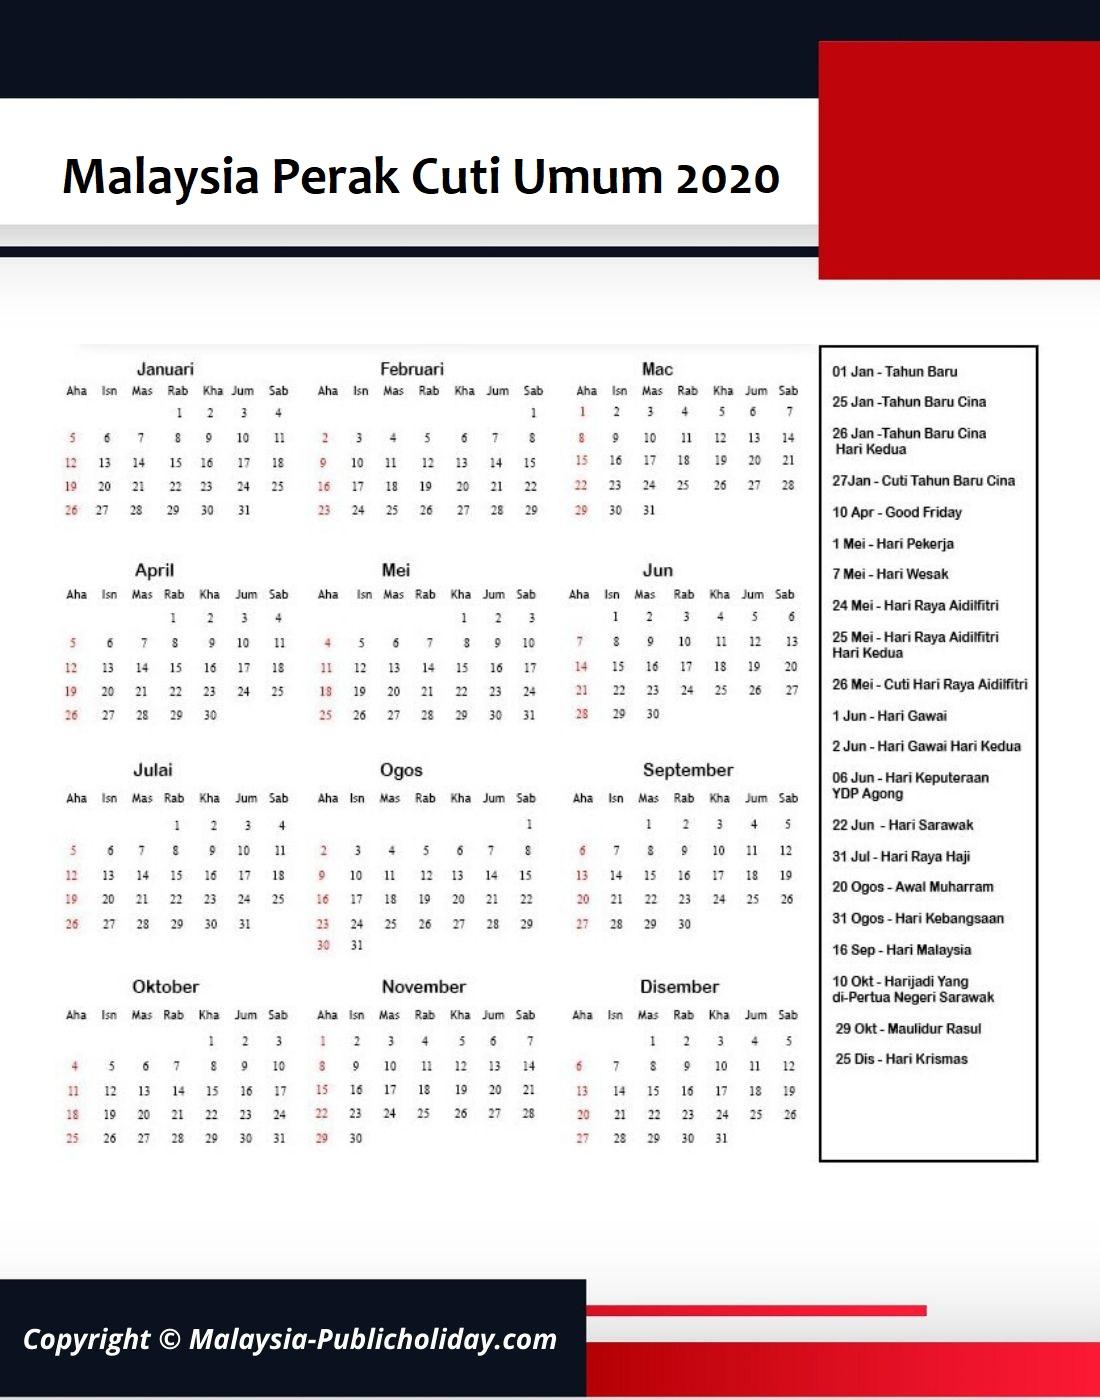 Cuti Umum Perak 2020 Malaysia